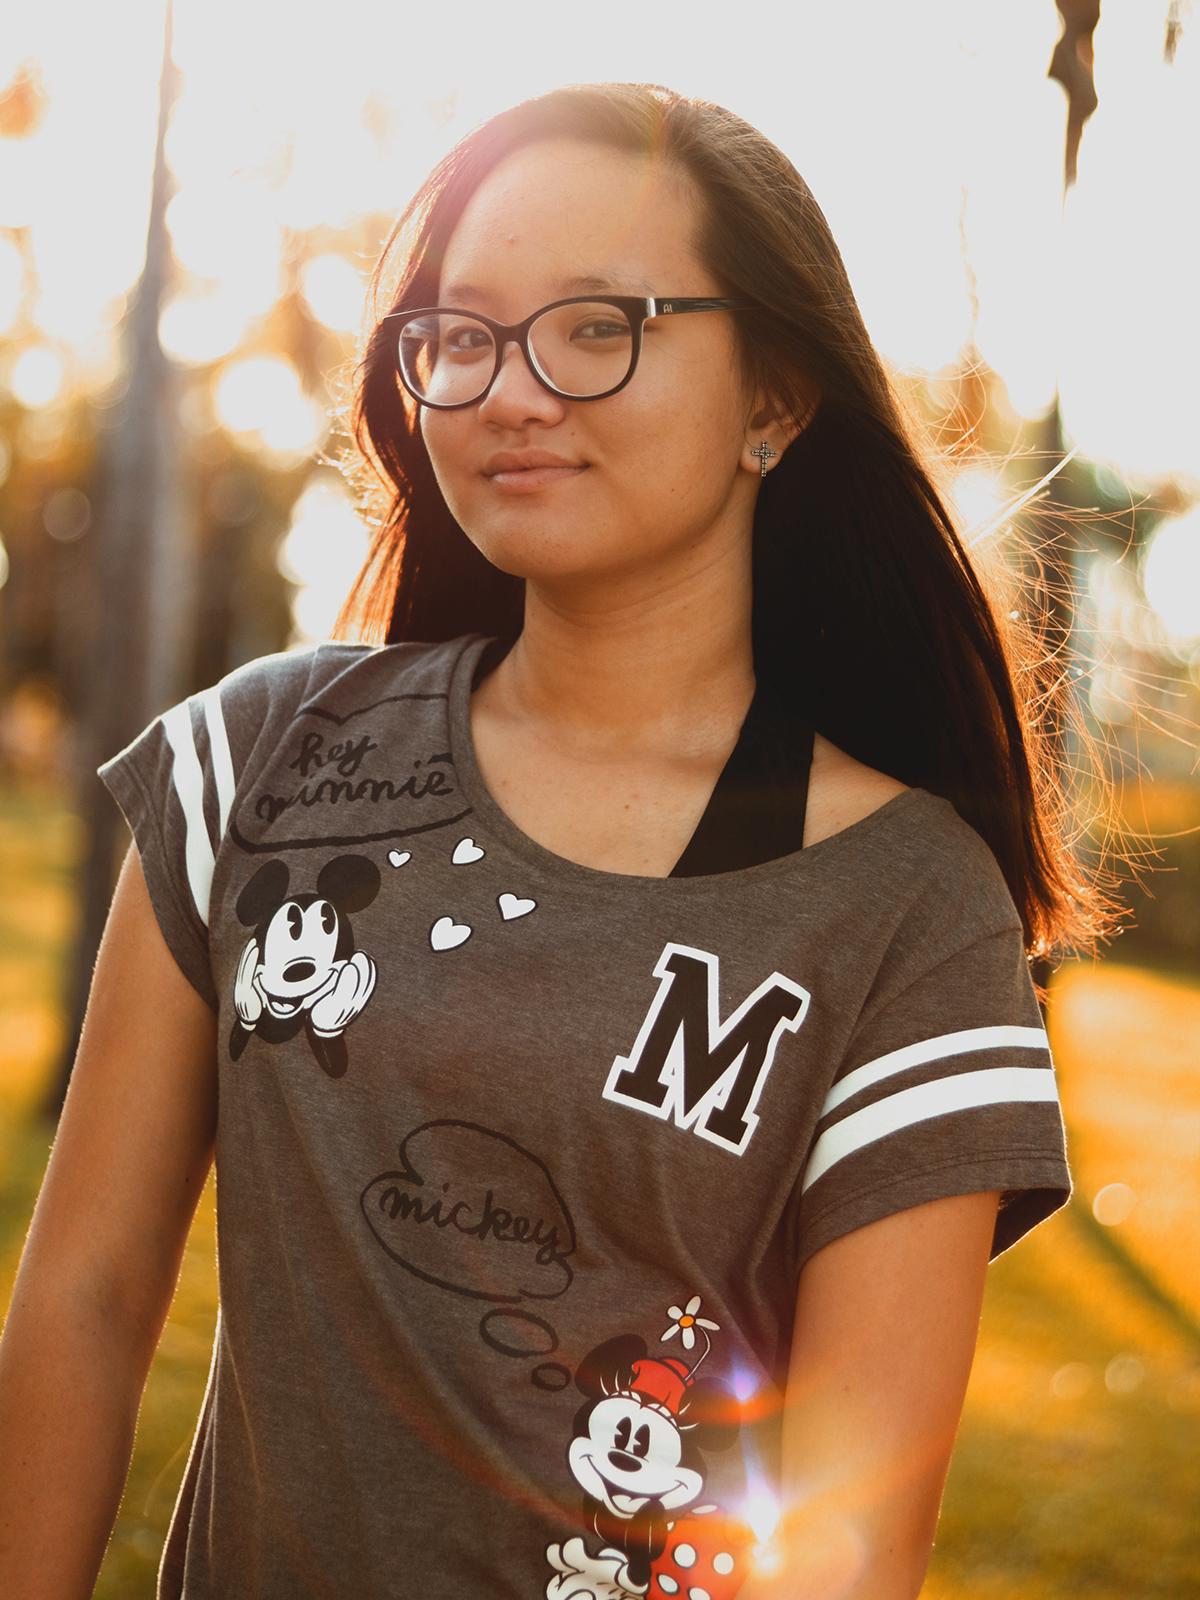 foto retrato garota fundo luz natural sol